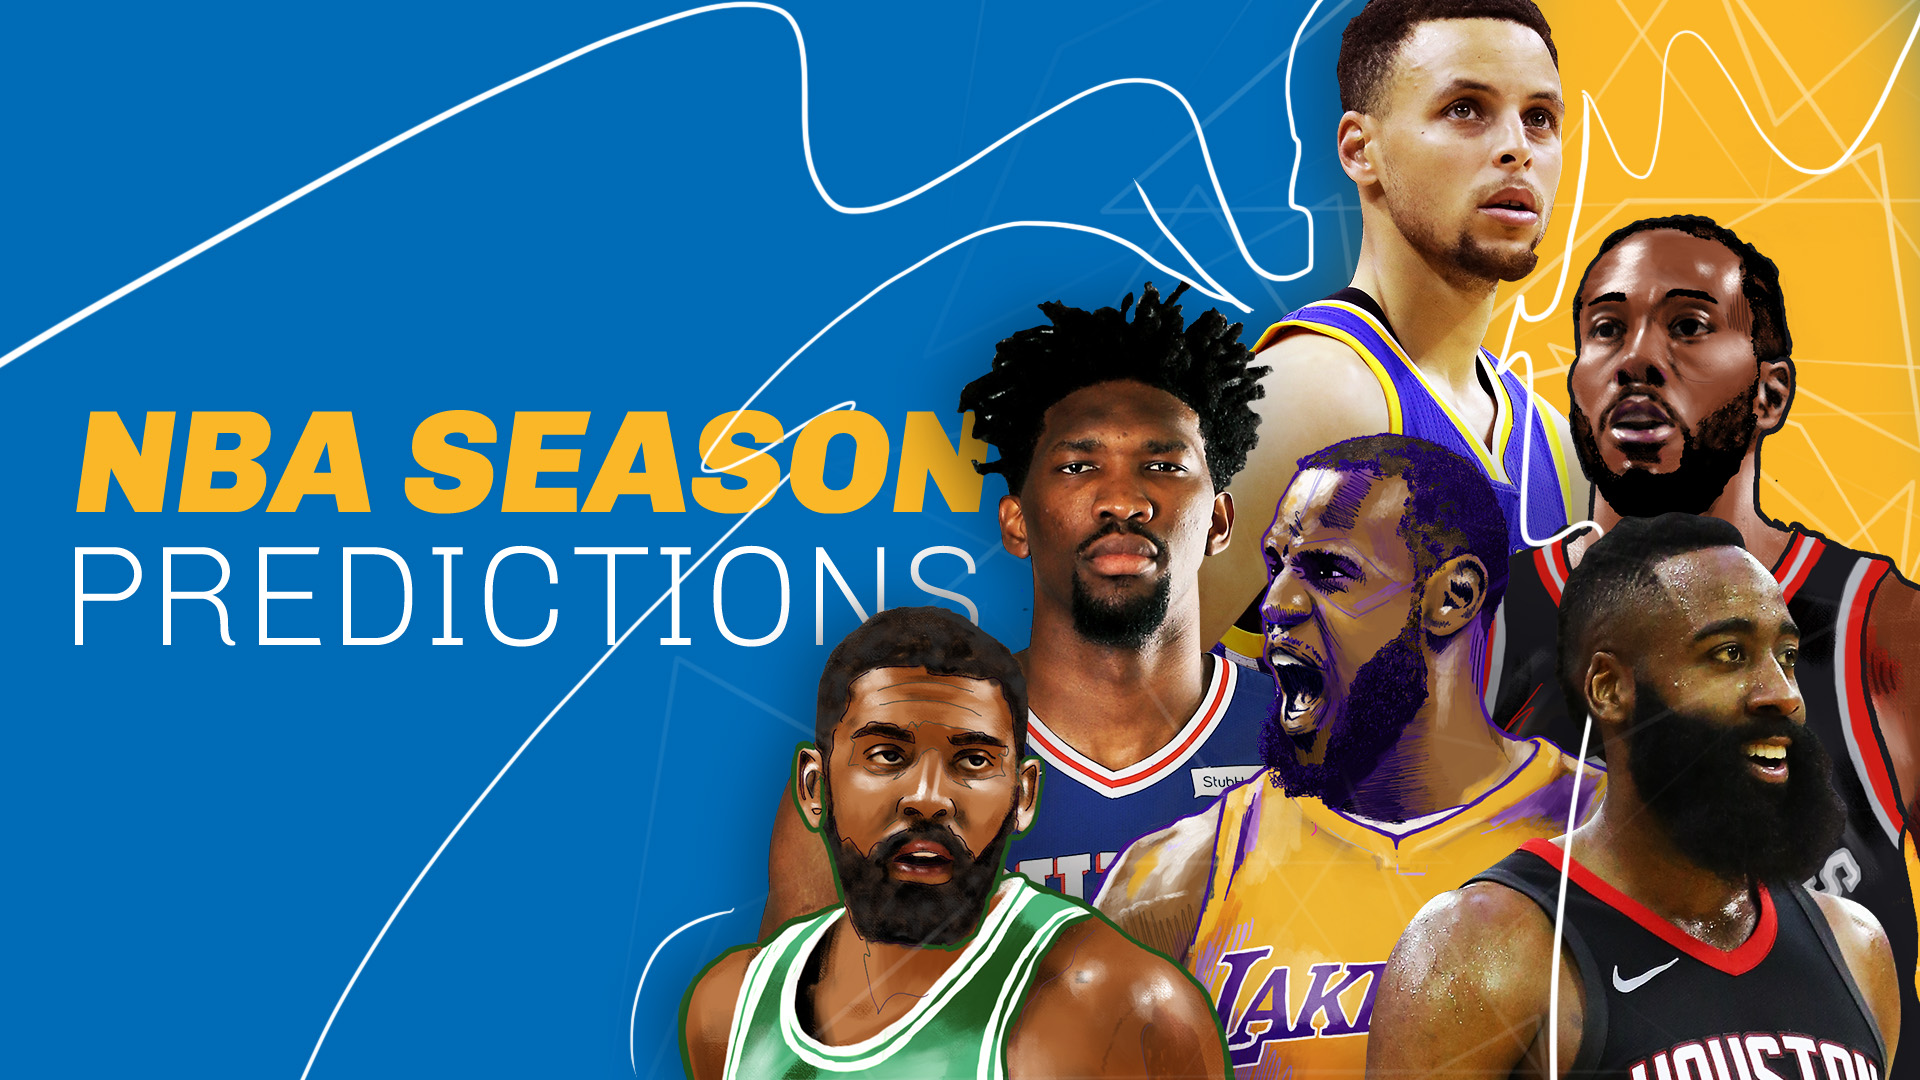 NBA season predictions 2018-19: East, West contenders look to end Warriors' dynasty | NBA ...